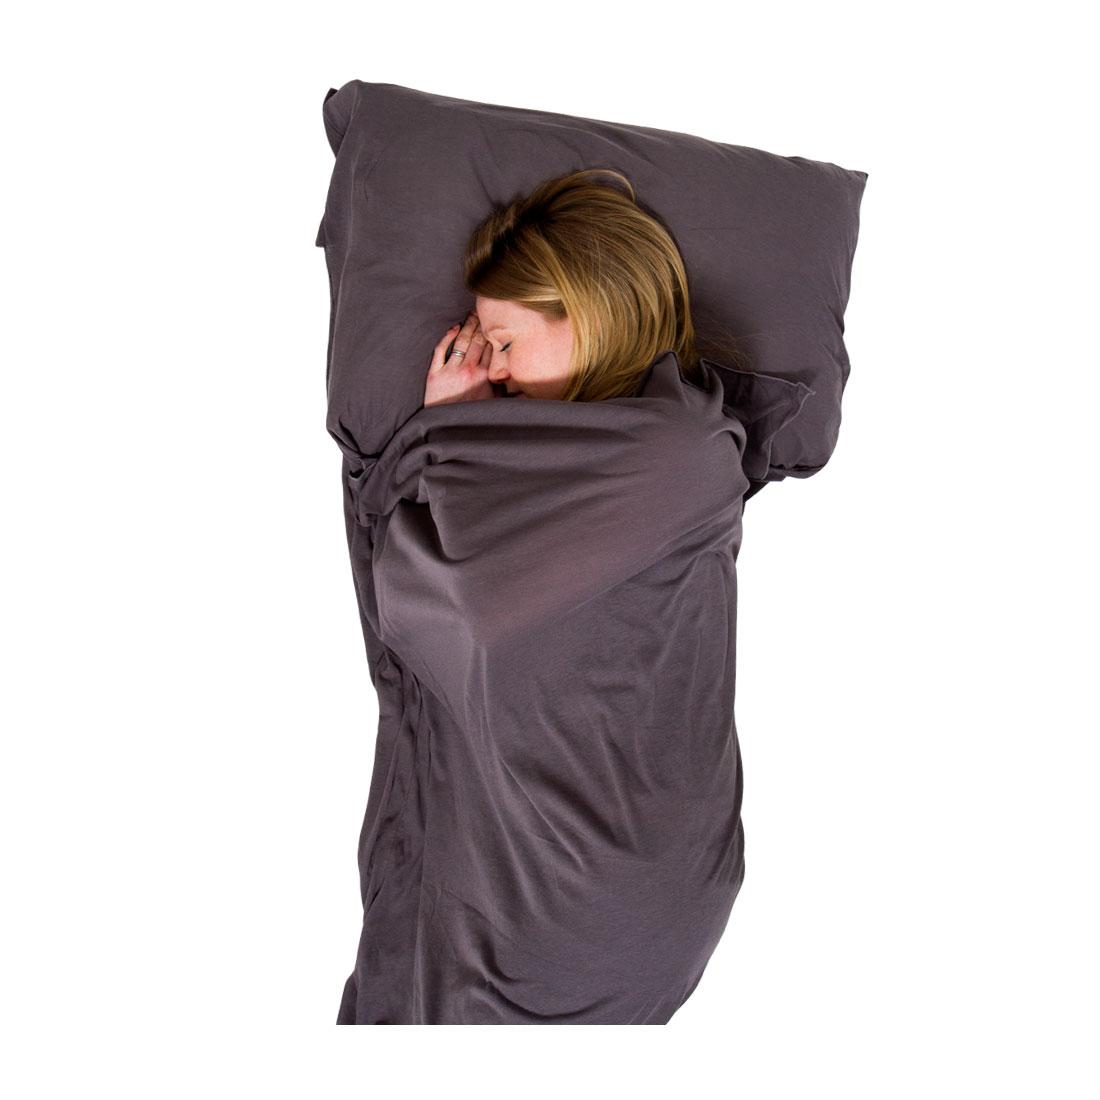 Cotton Stretch Sleeping Bag Liner (rectangular)